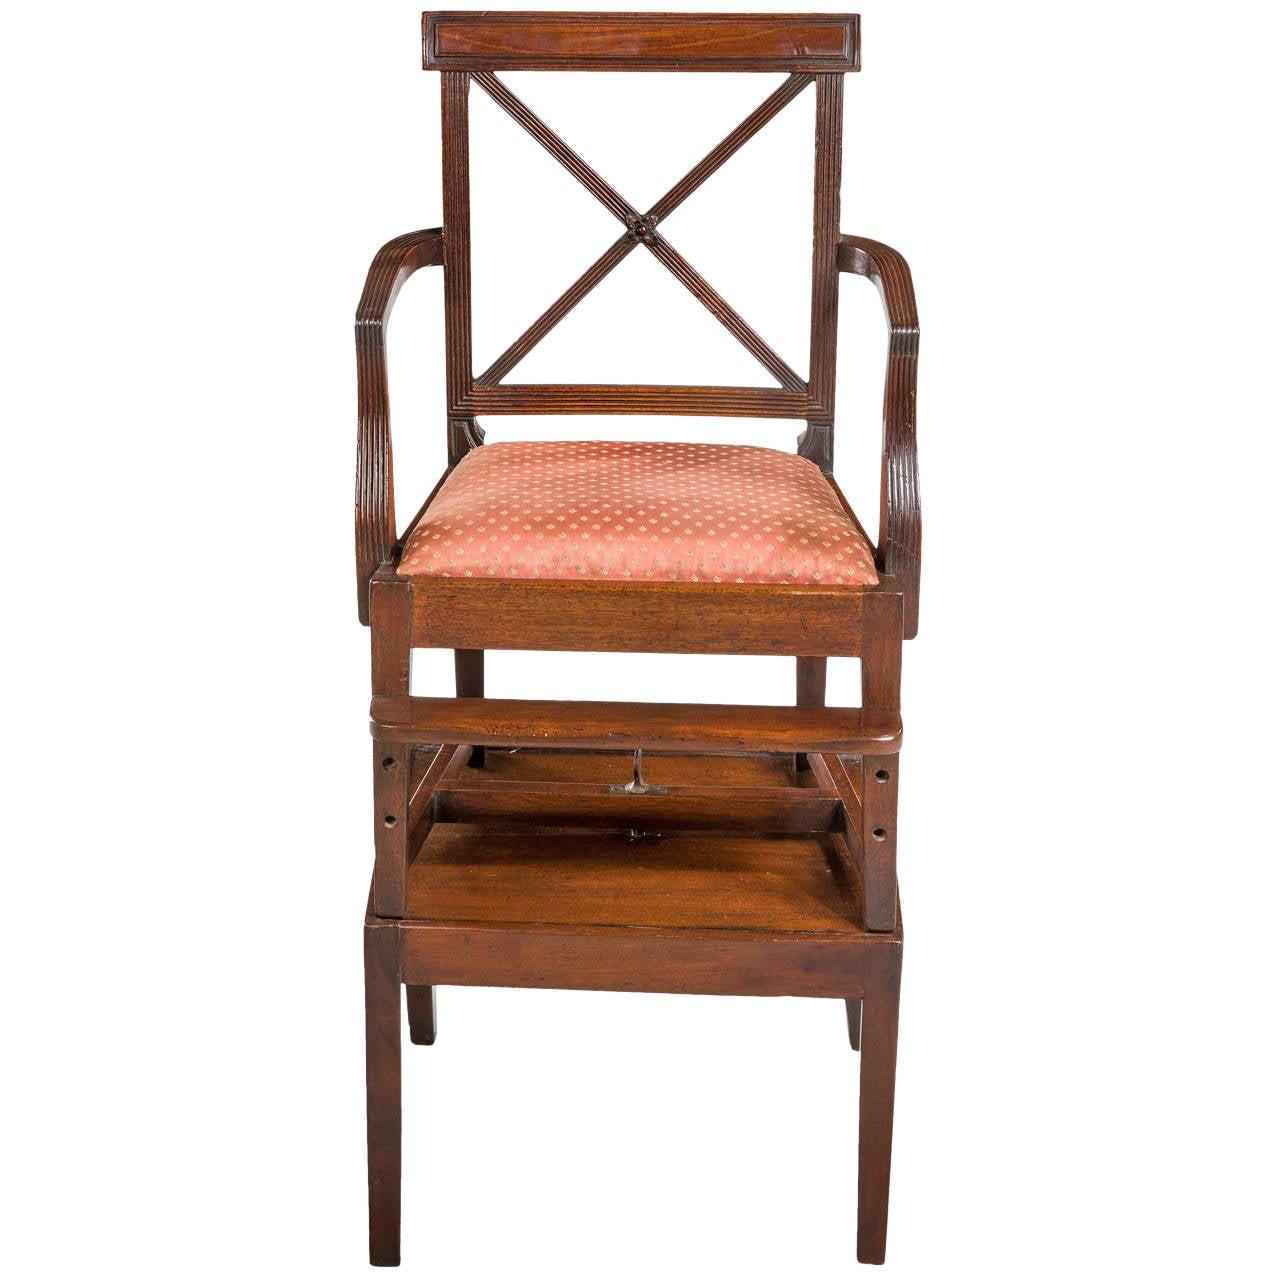 George III Period Mahogany Child's Chair